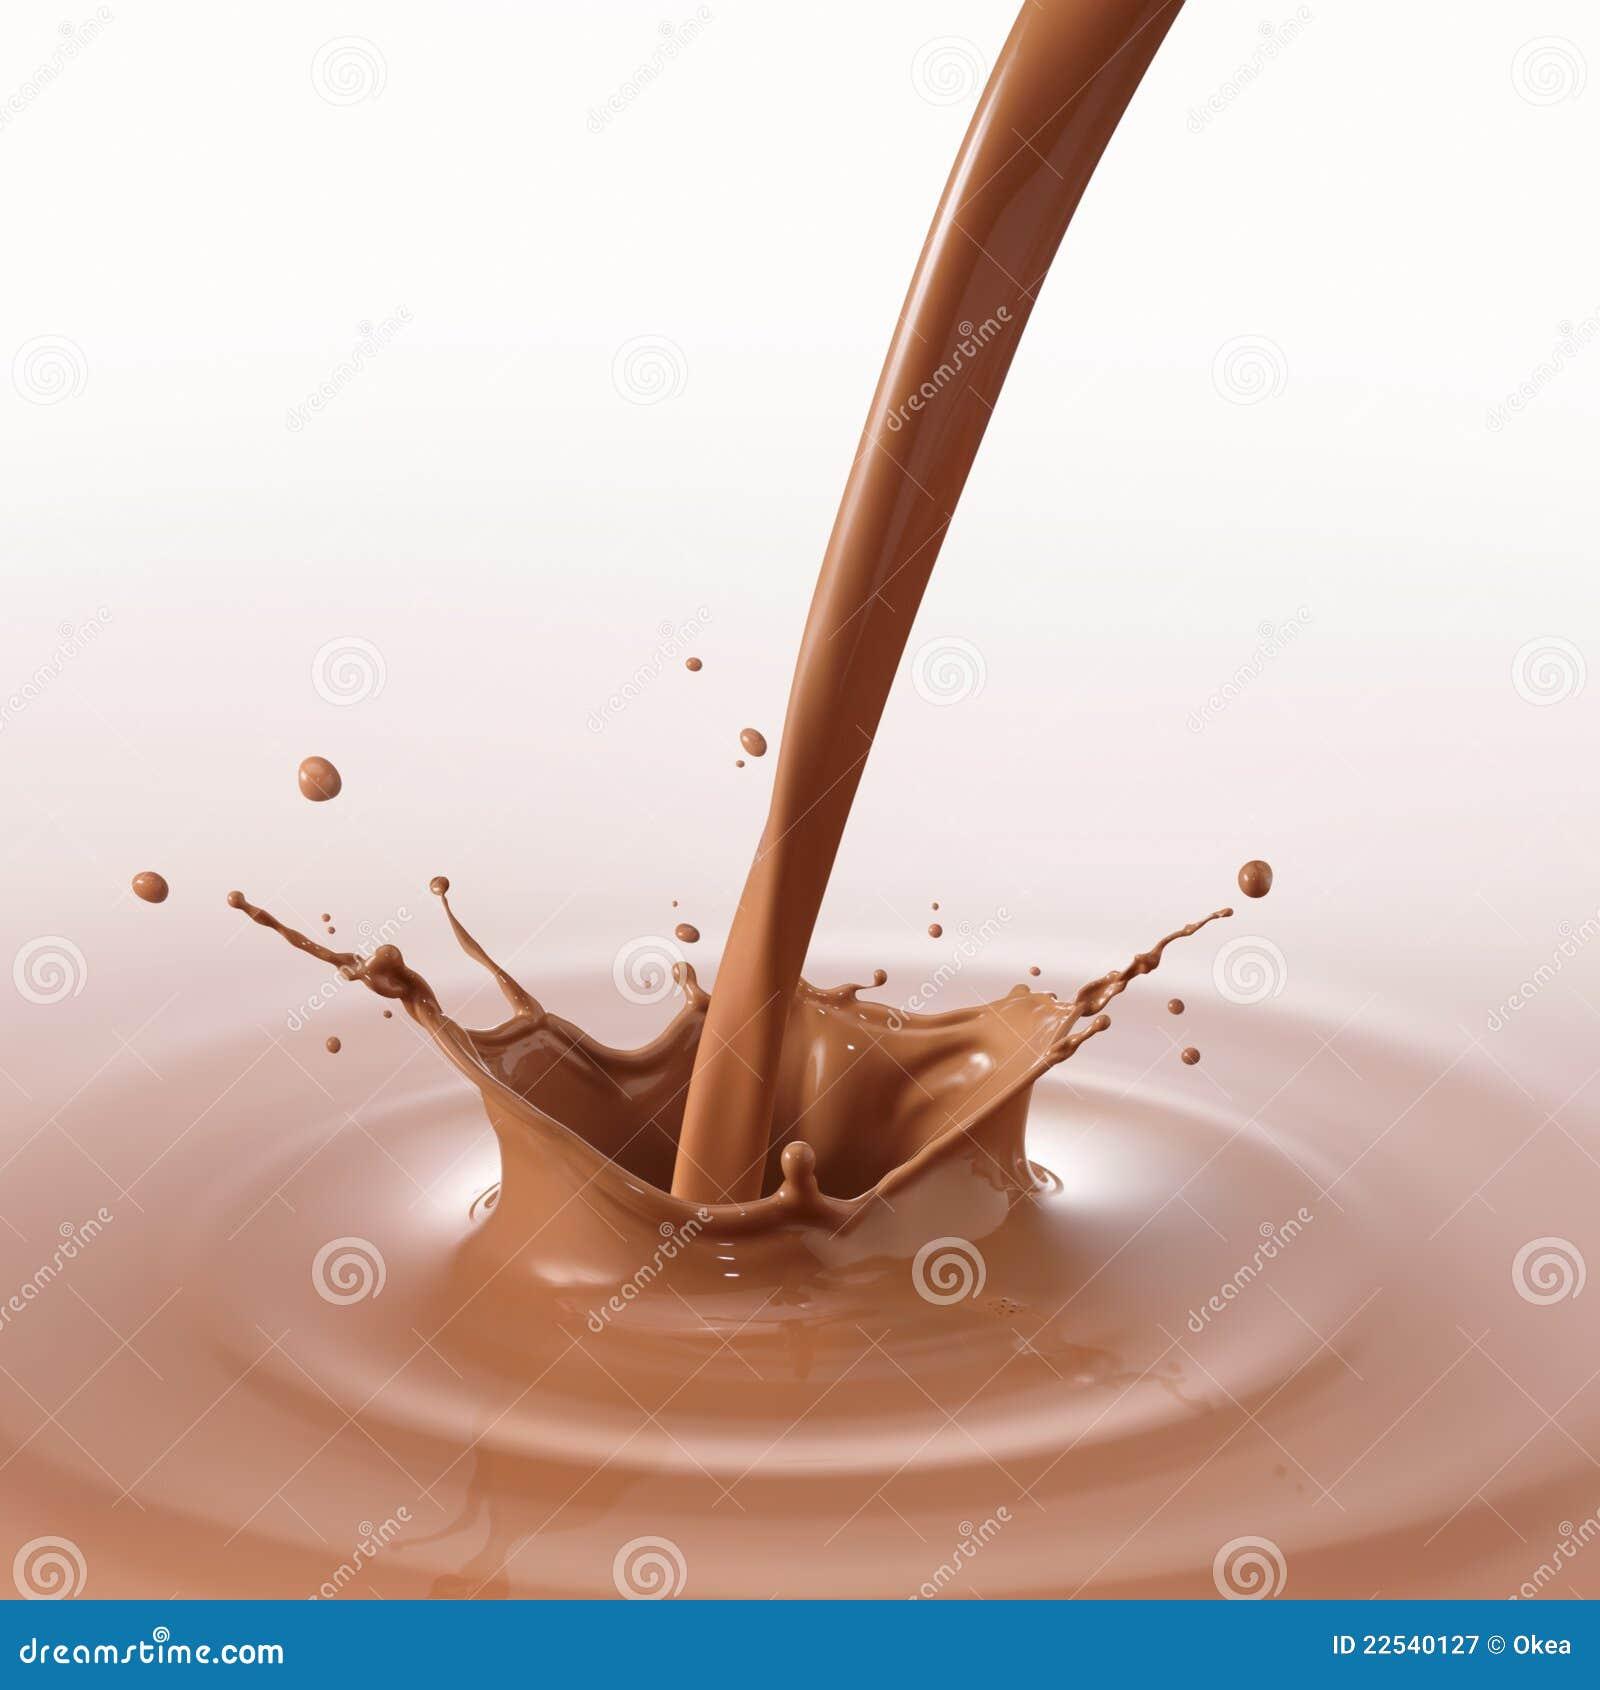 Strömende Schokolade